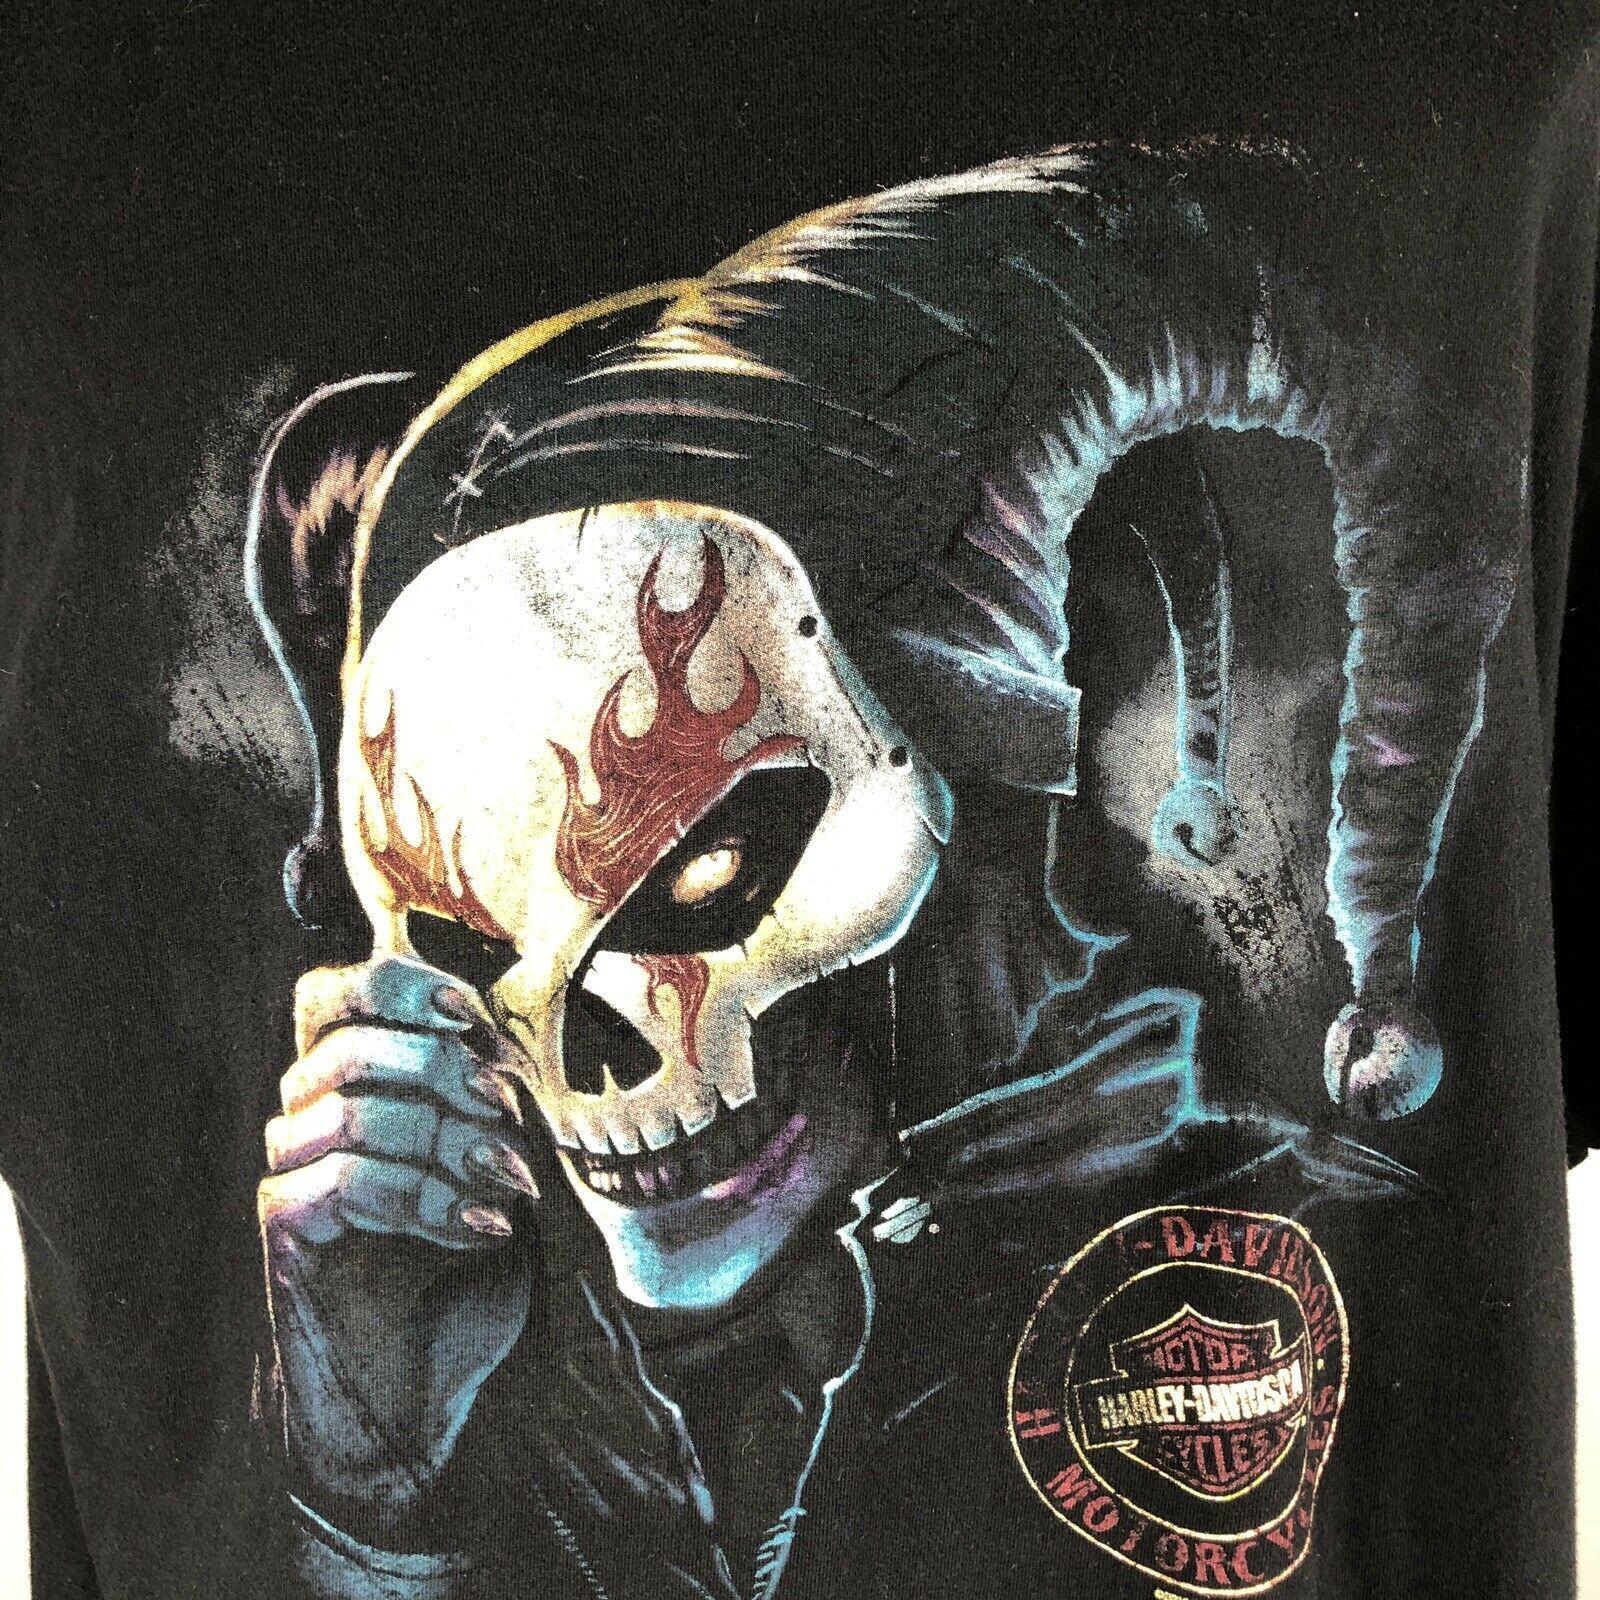 Harley Davidson T Shirt Skeleton Clown Size XL Sturgis MI Black Motorcycle